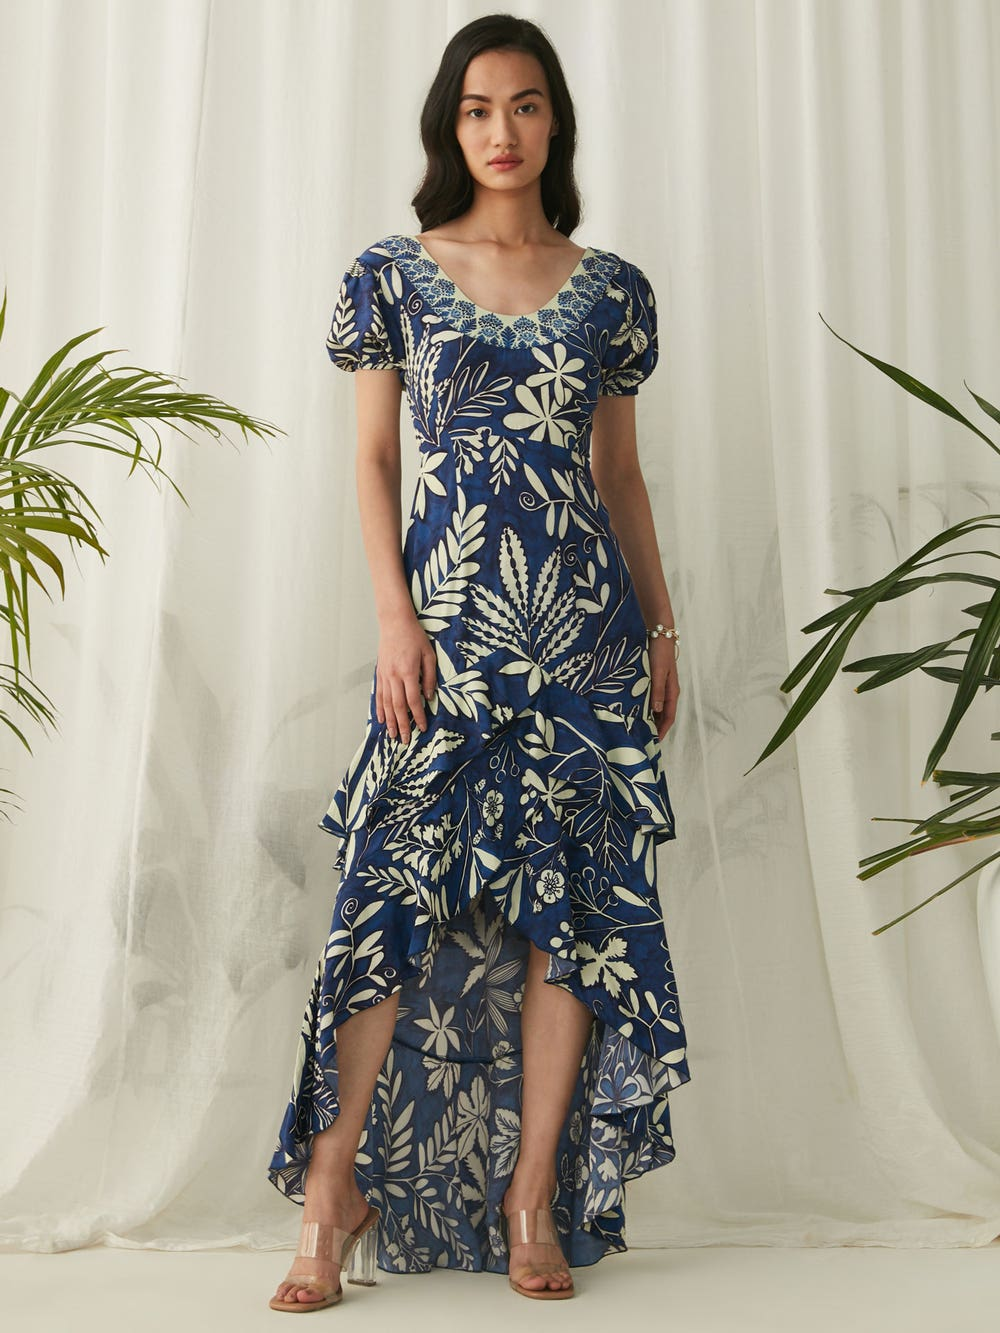 Blue Floral Printed Ruffle Dress